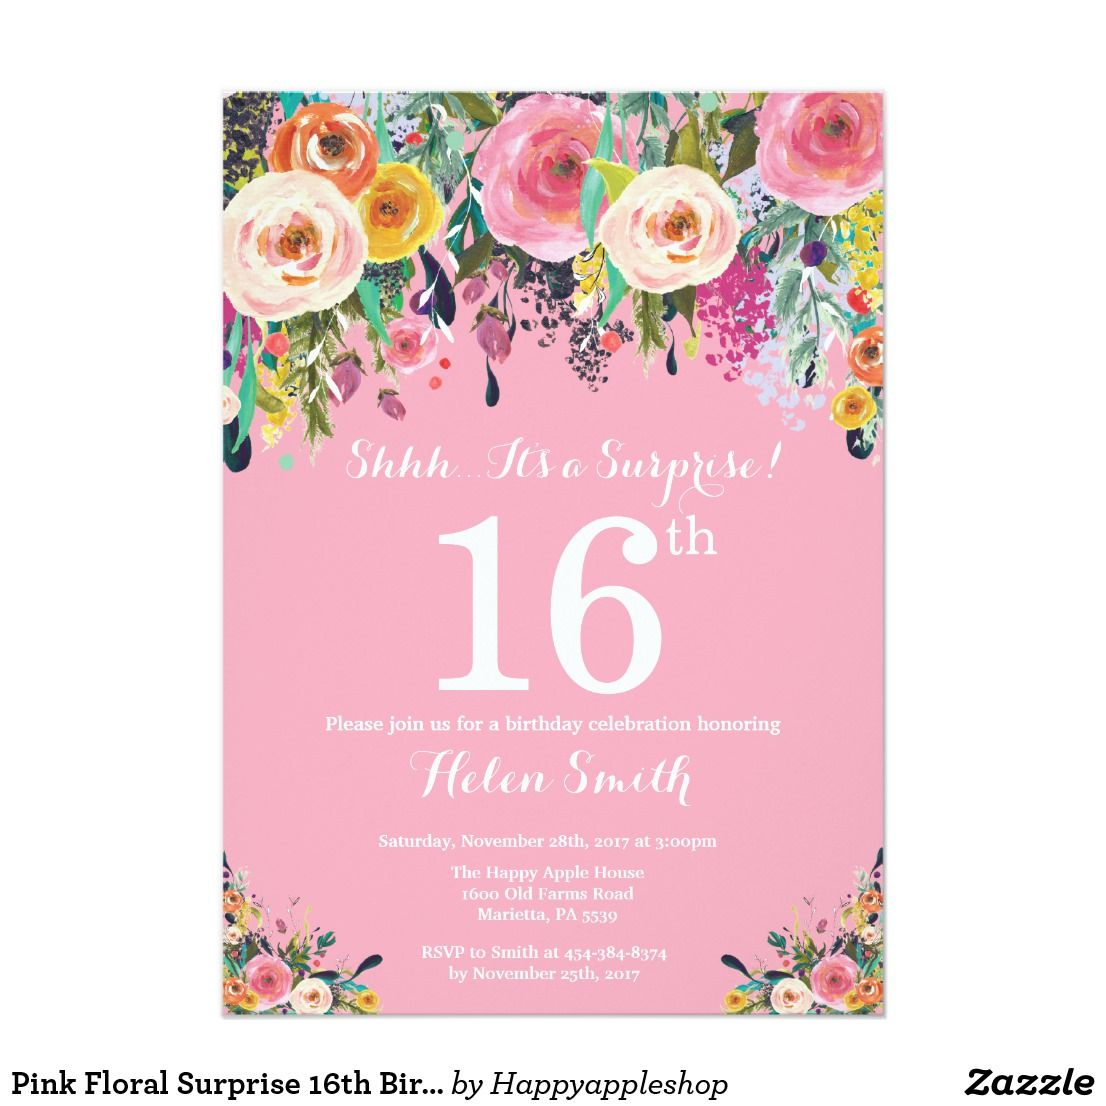 Pink Floral Surprise 16th Birthday Invitation